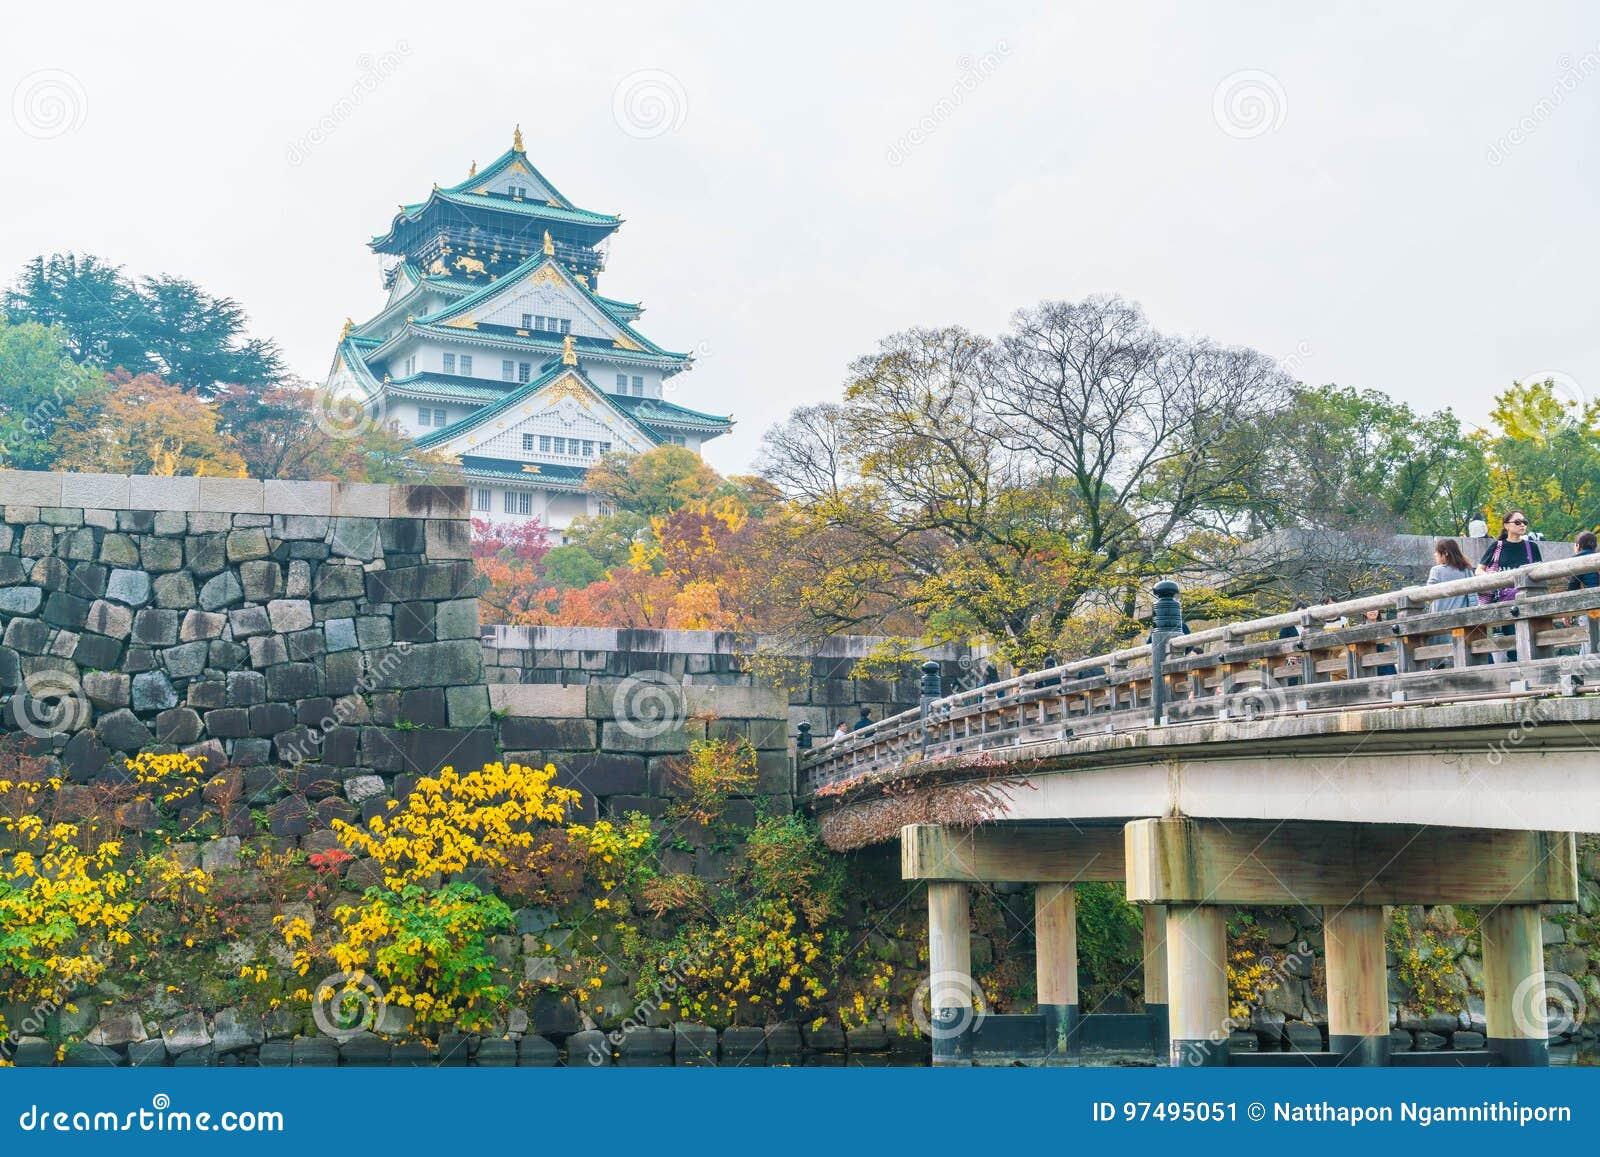 OSAKA, GIAPPONE - 20 NOVEMBRE: Ospiti ammucchiati ad Osaka Castle Park I